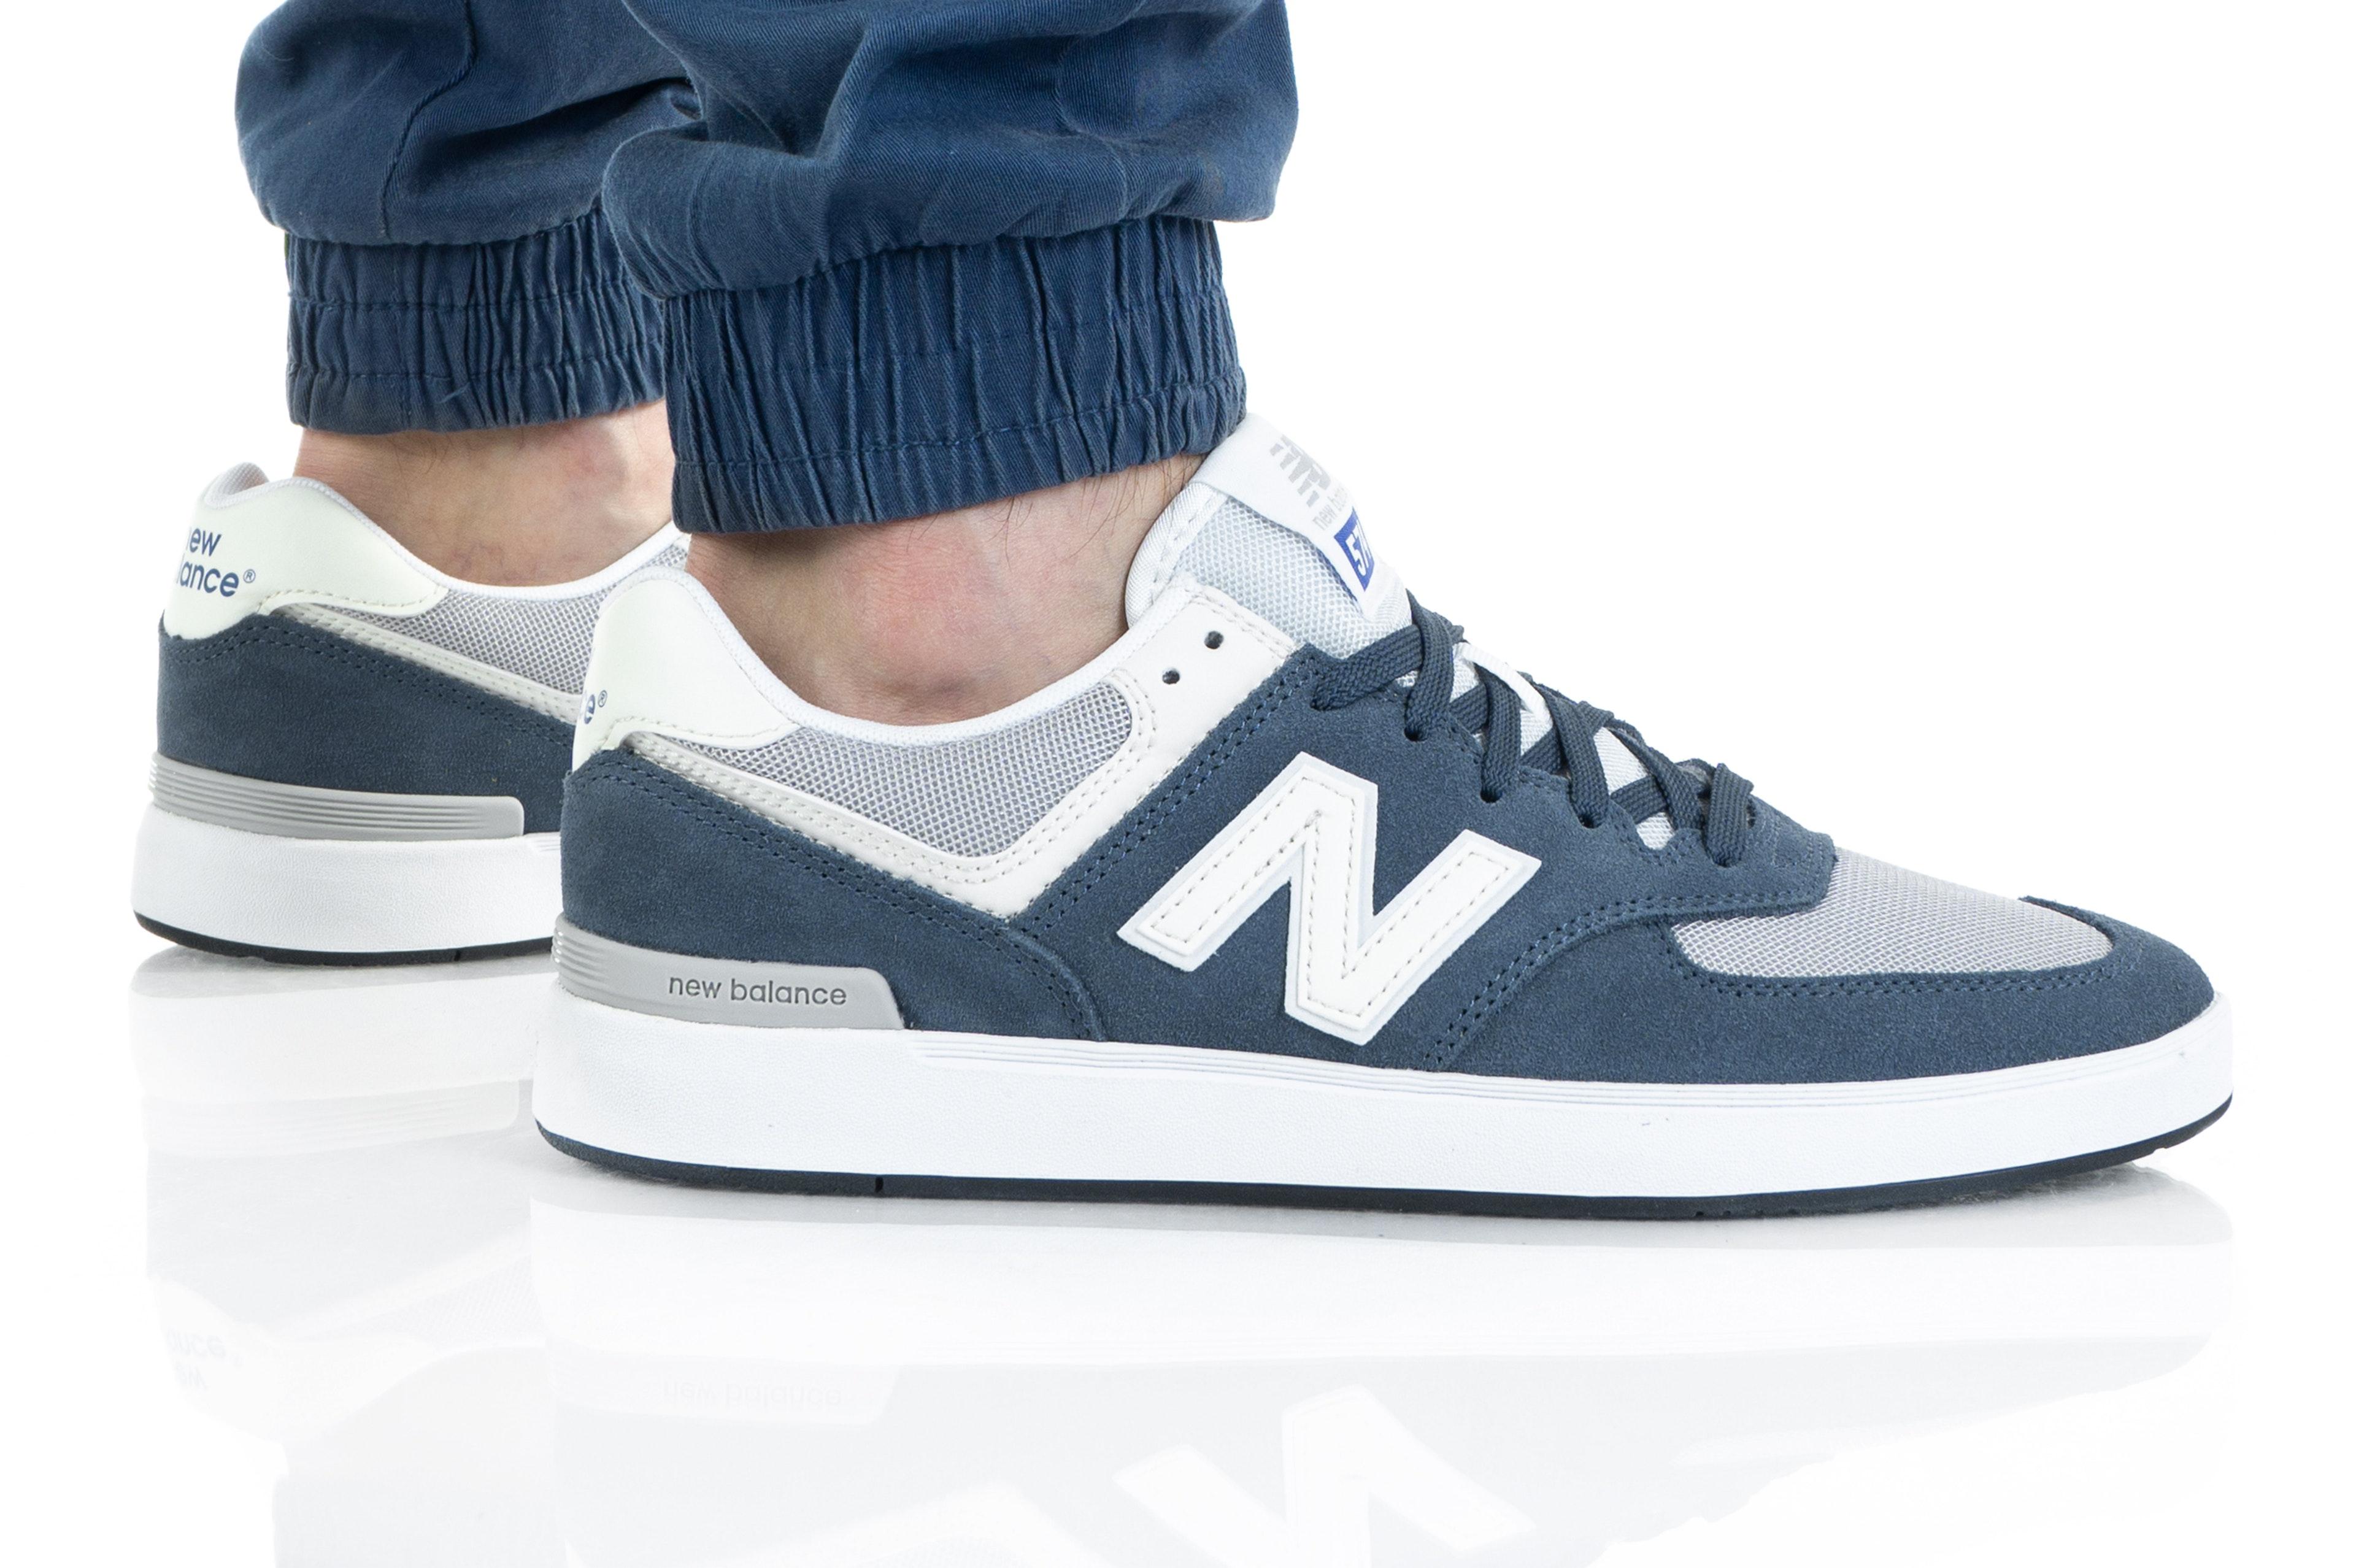 New Balance 574 AM574PHA